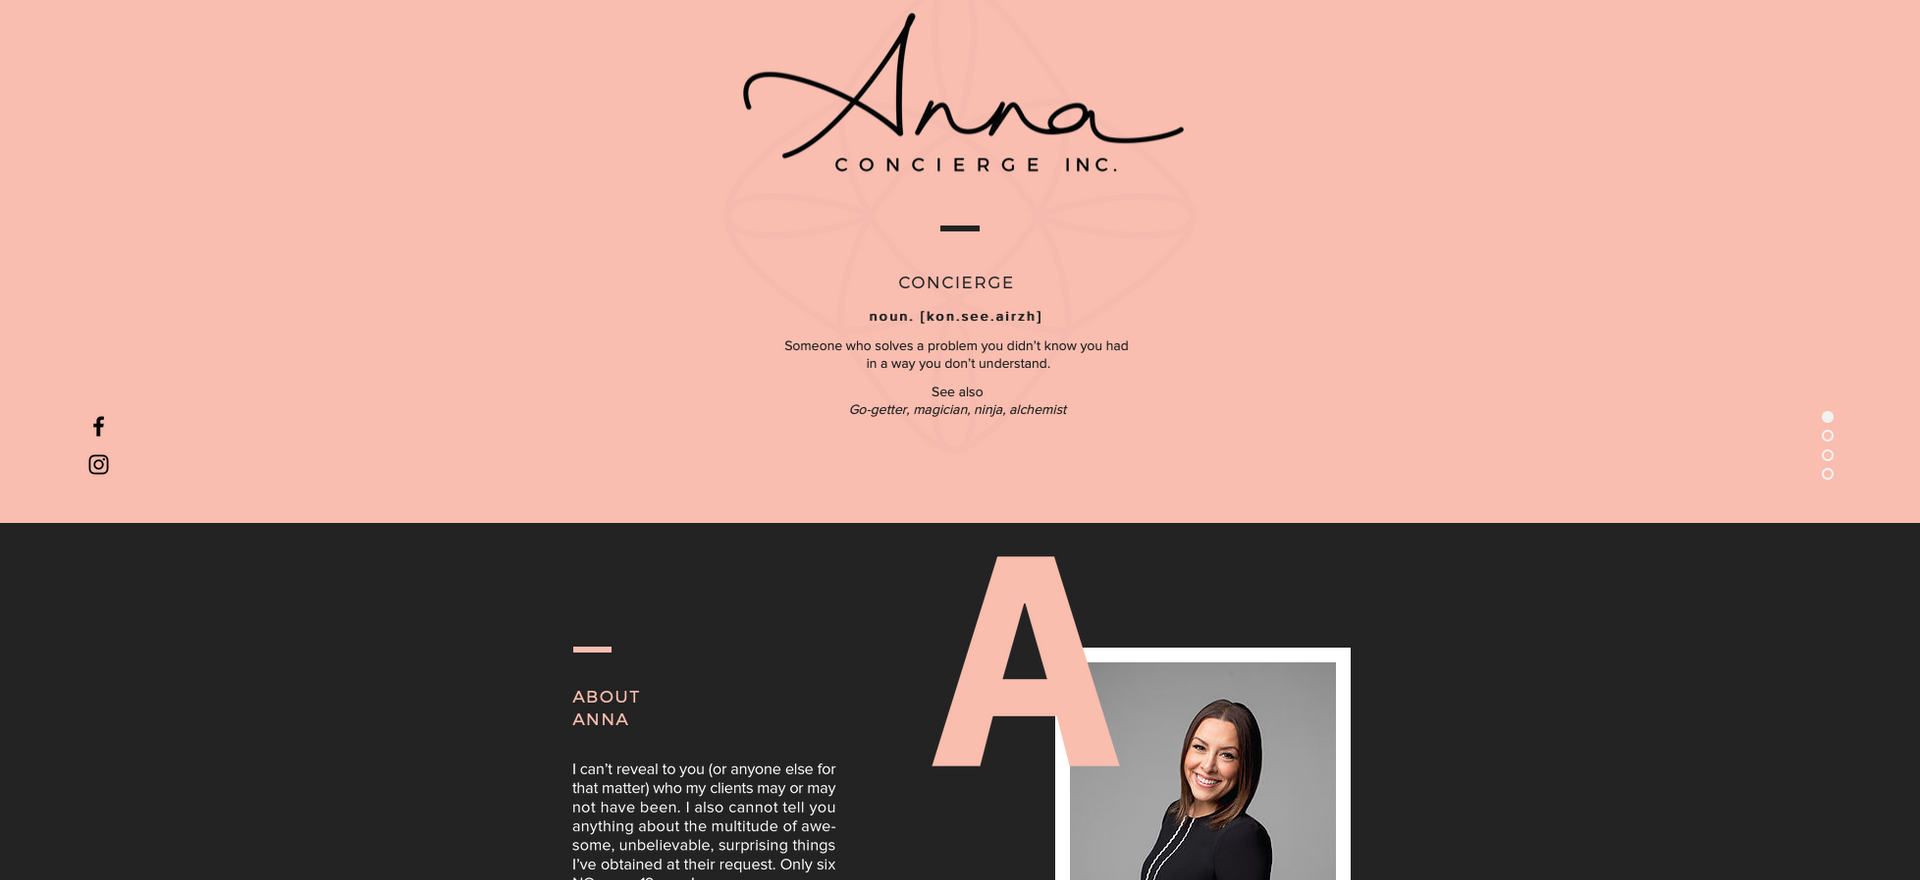 Anna Concierge website